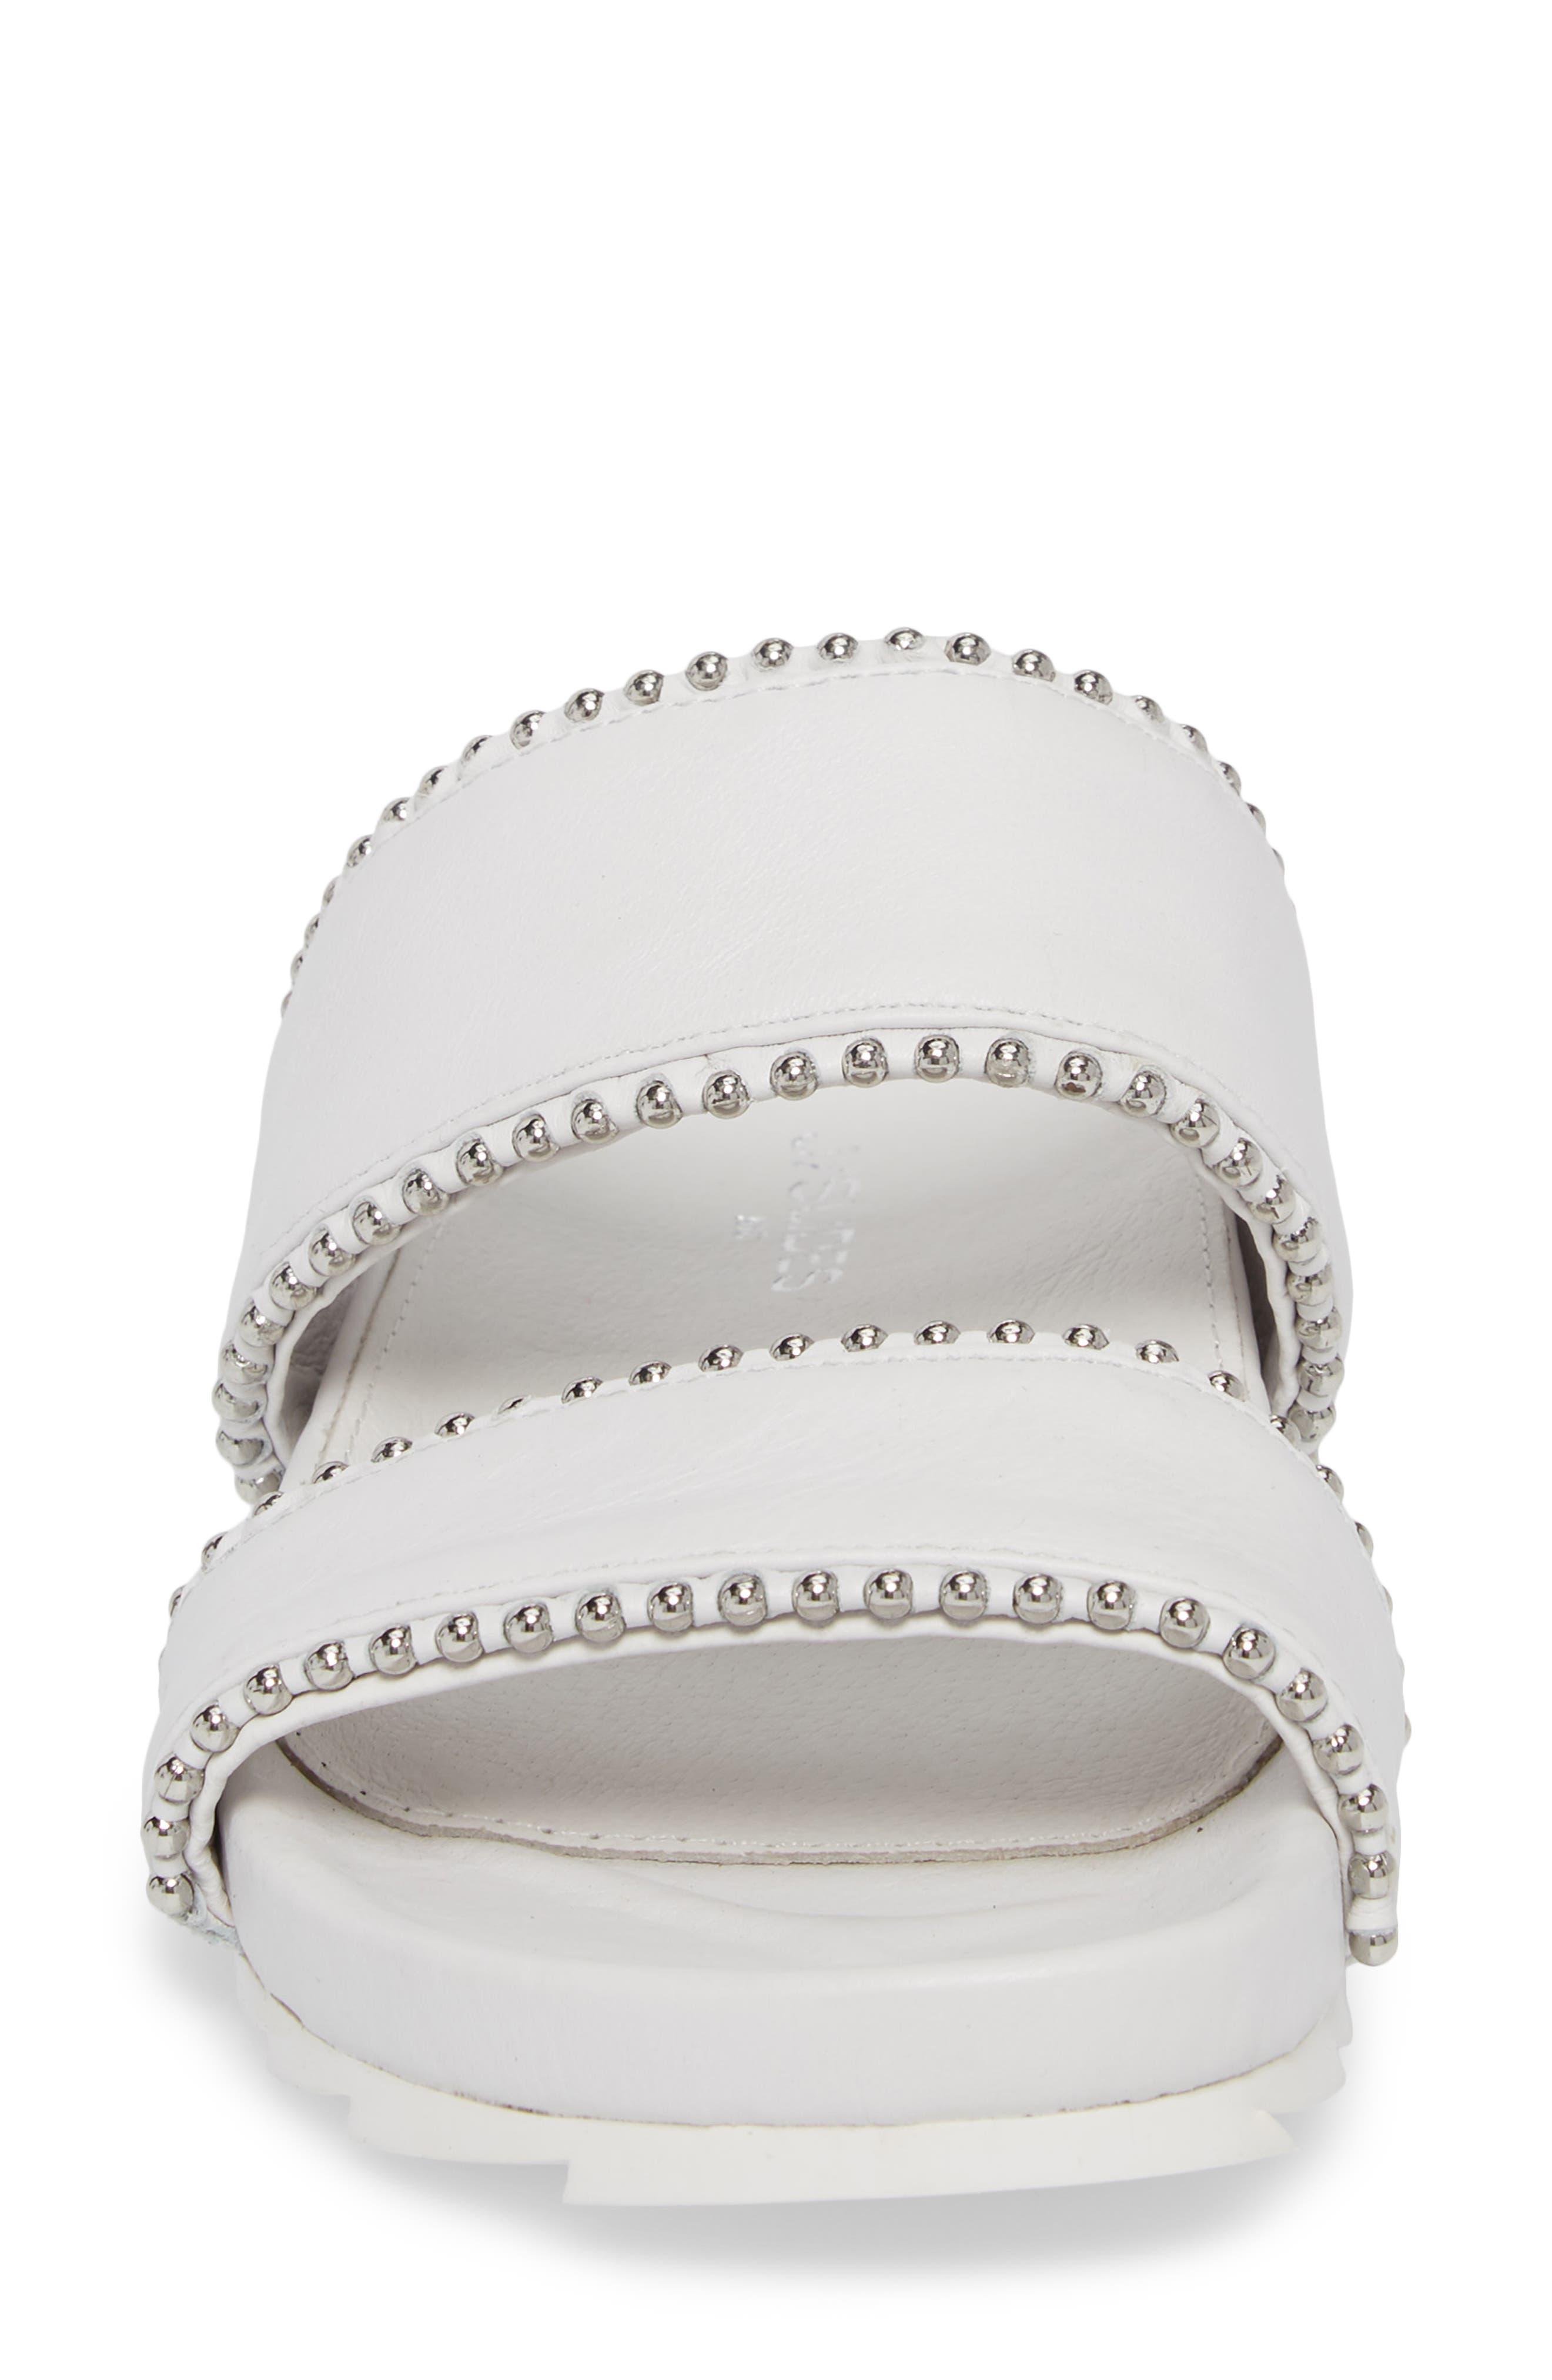 Emmie Bead Chain Slide Sandal,                             Alternate thumbnail 4, color,                             White Leather